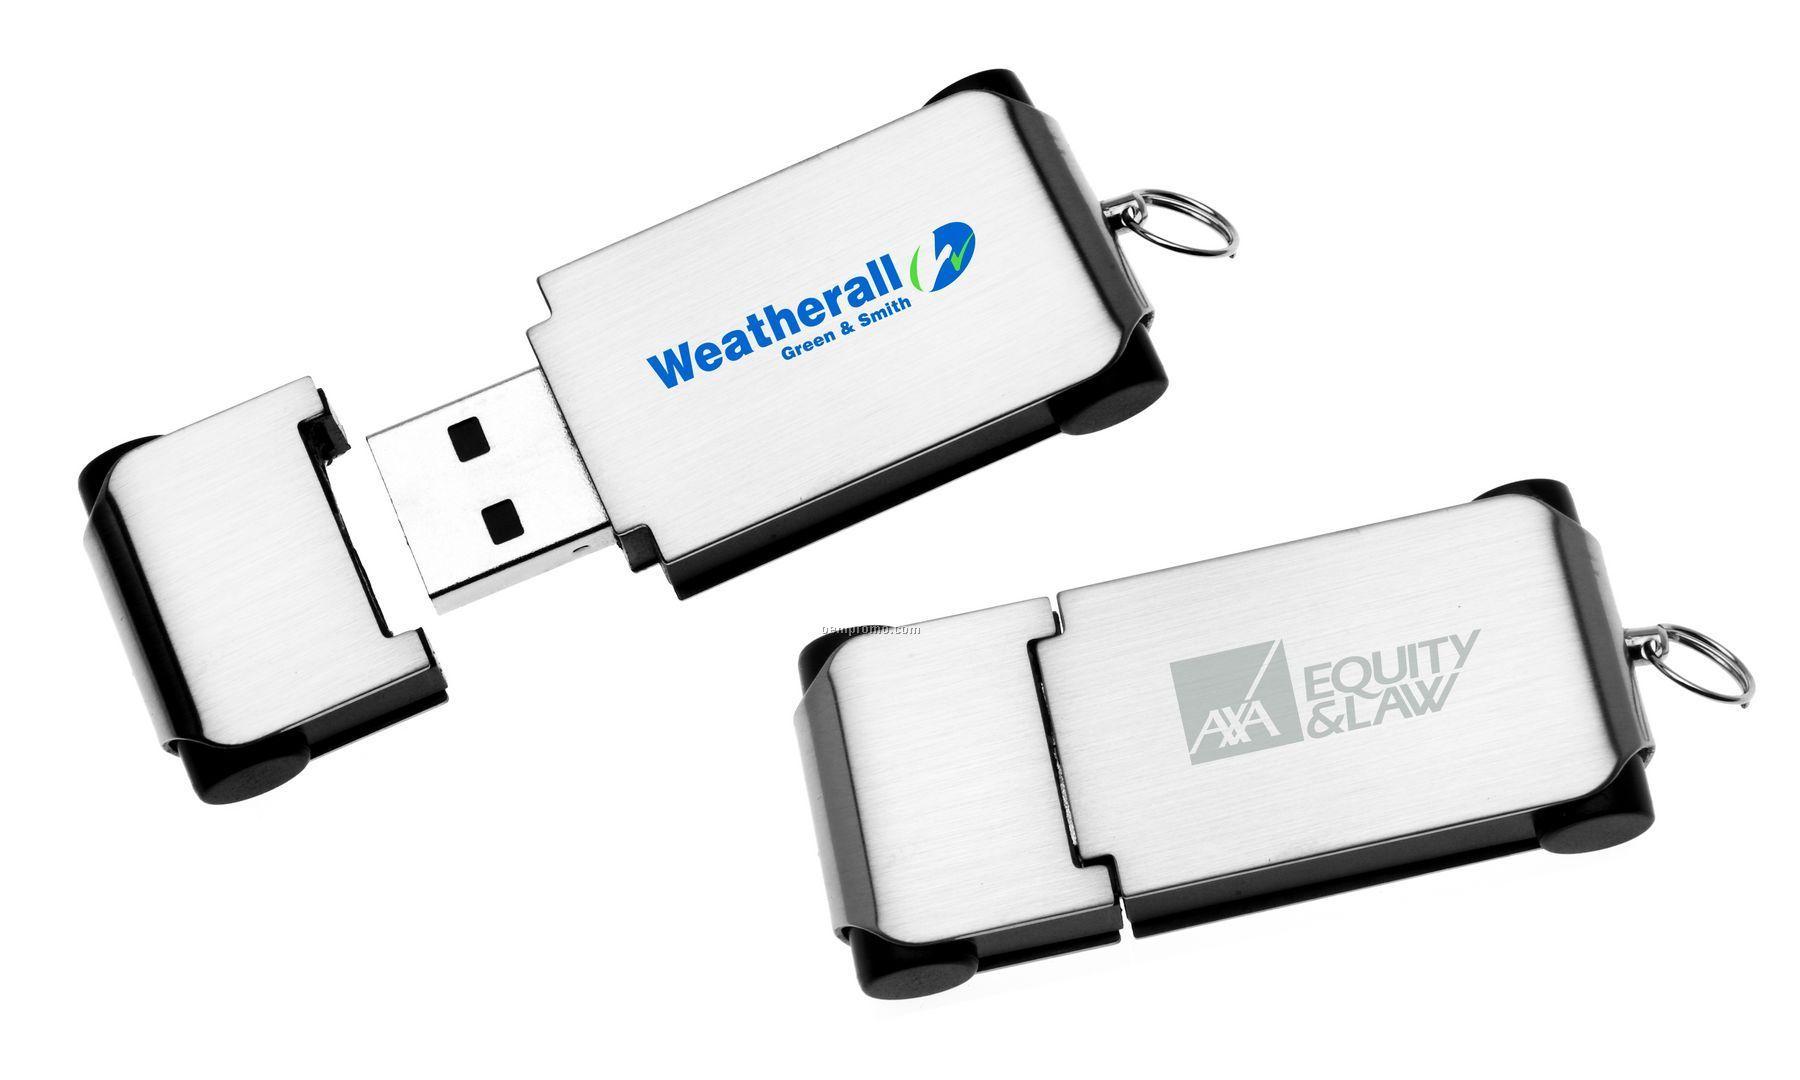 Rimini USB Flash Drive (128 Mb)